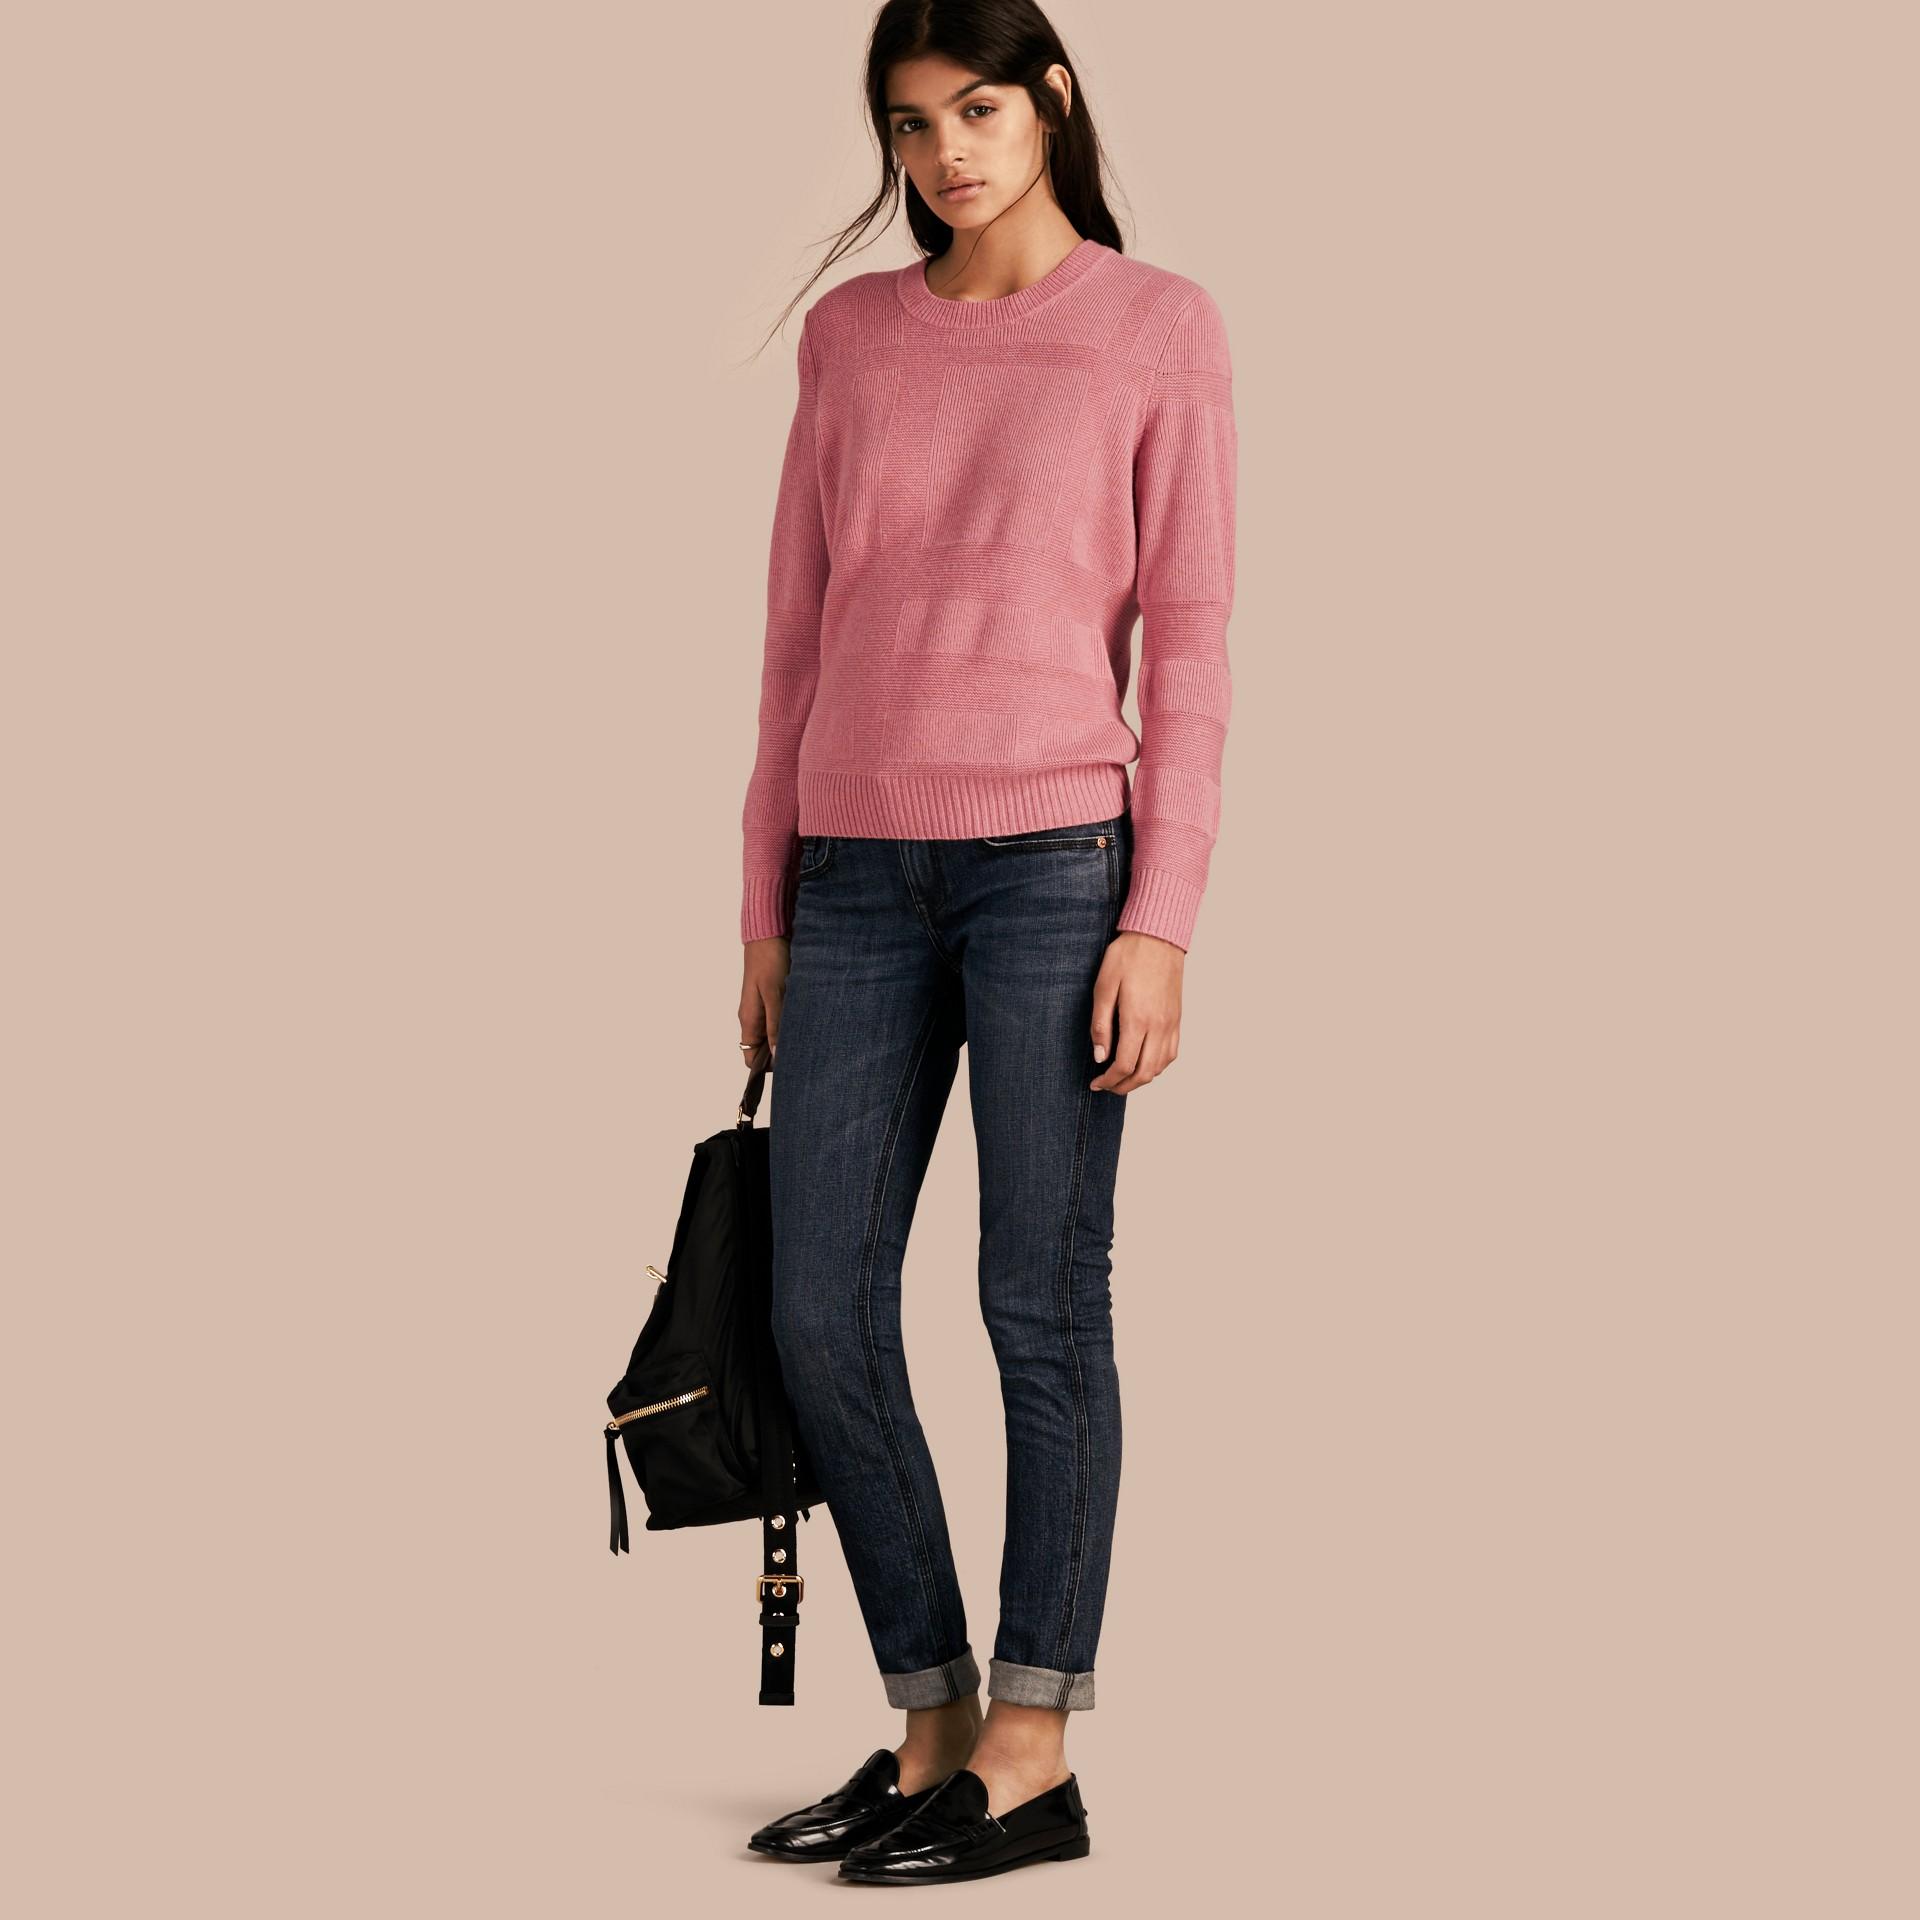 Hydrangea pink melange Check-knit Wool Cashmere Sweater Hydrangea Pink Melange - gallery image 1